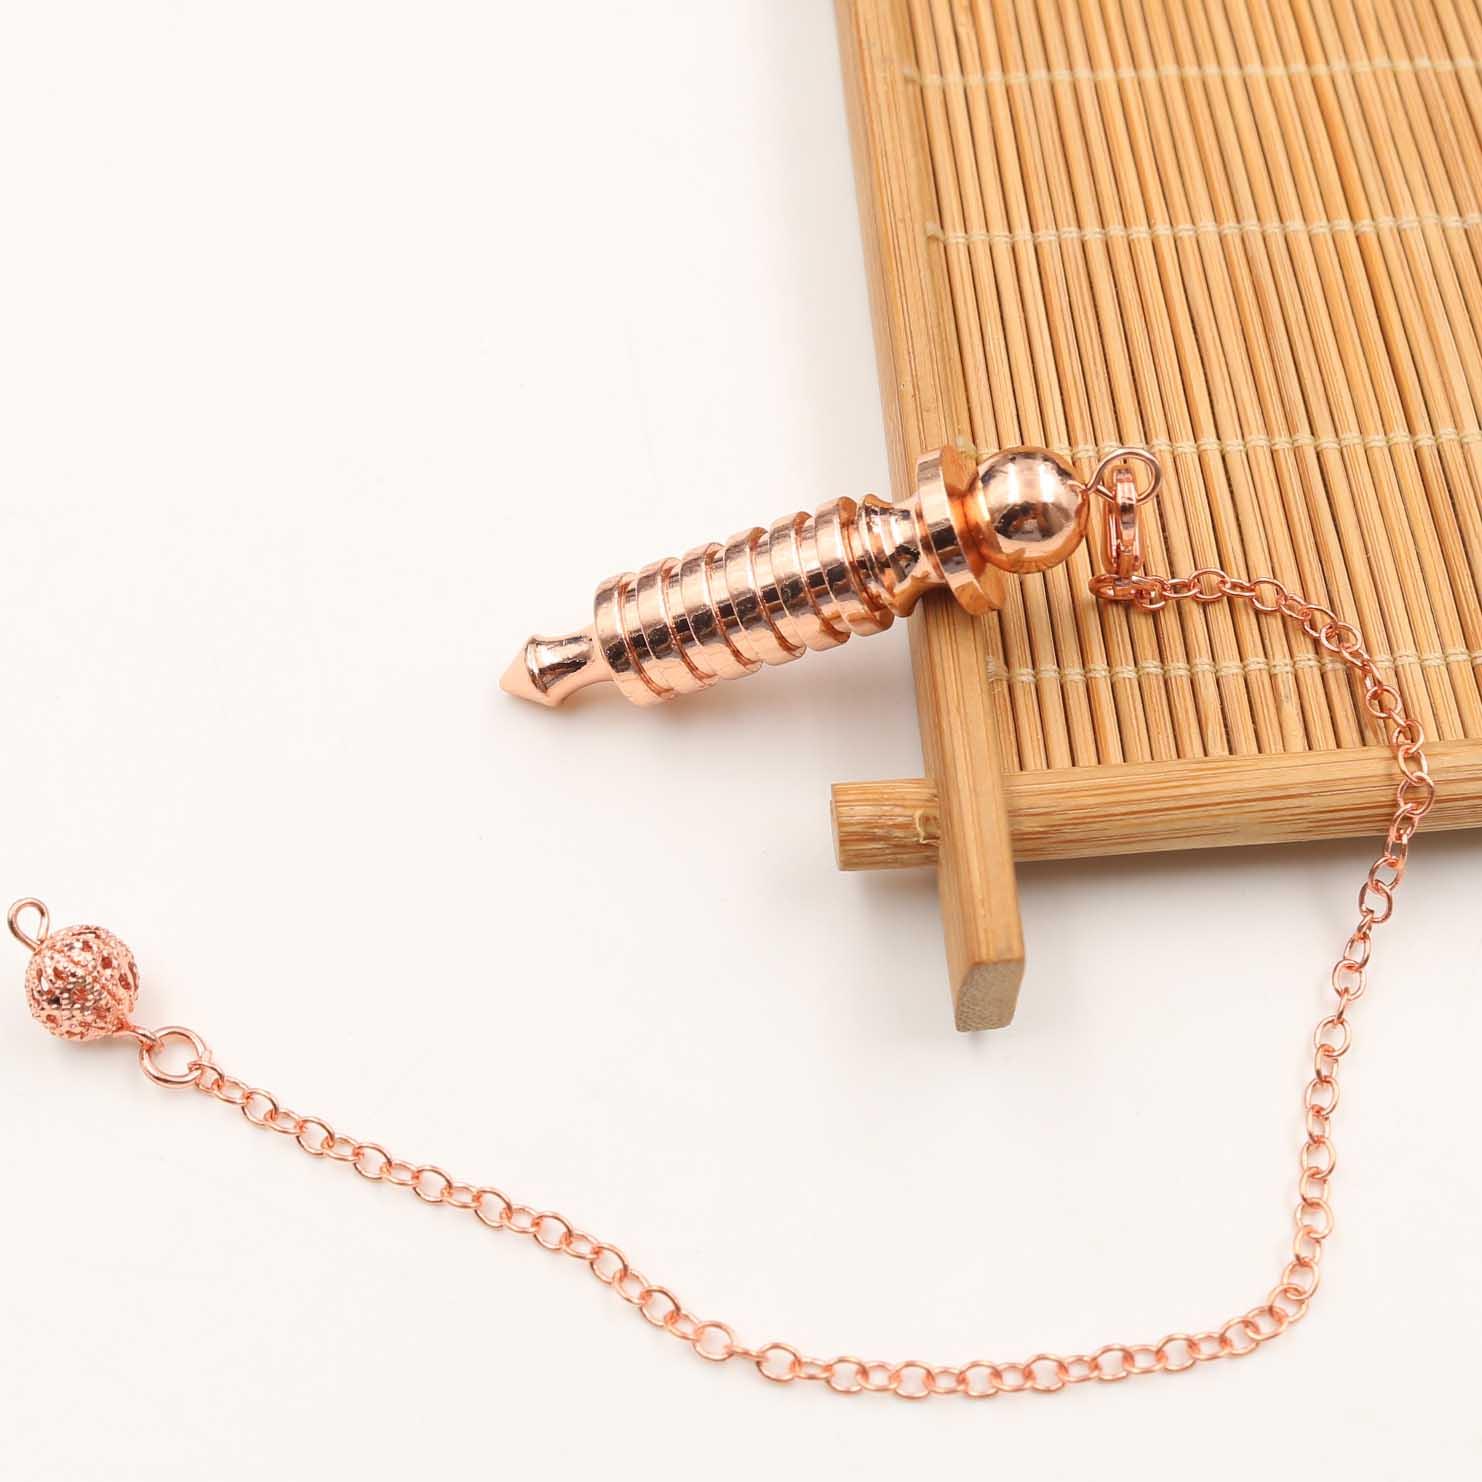 Metal Pendulums for Dowsing Divination Reiki Healing Spiritual Wicca Women Men Amulet Screw Shape Pendule Chains Charm Jewelry 6